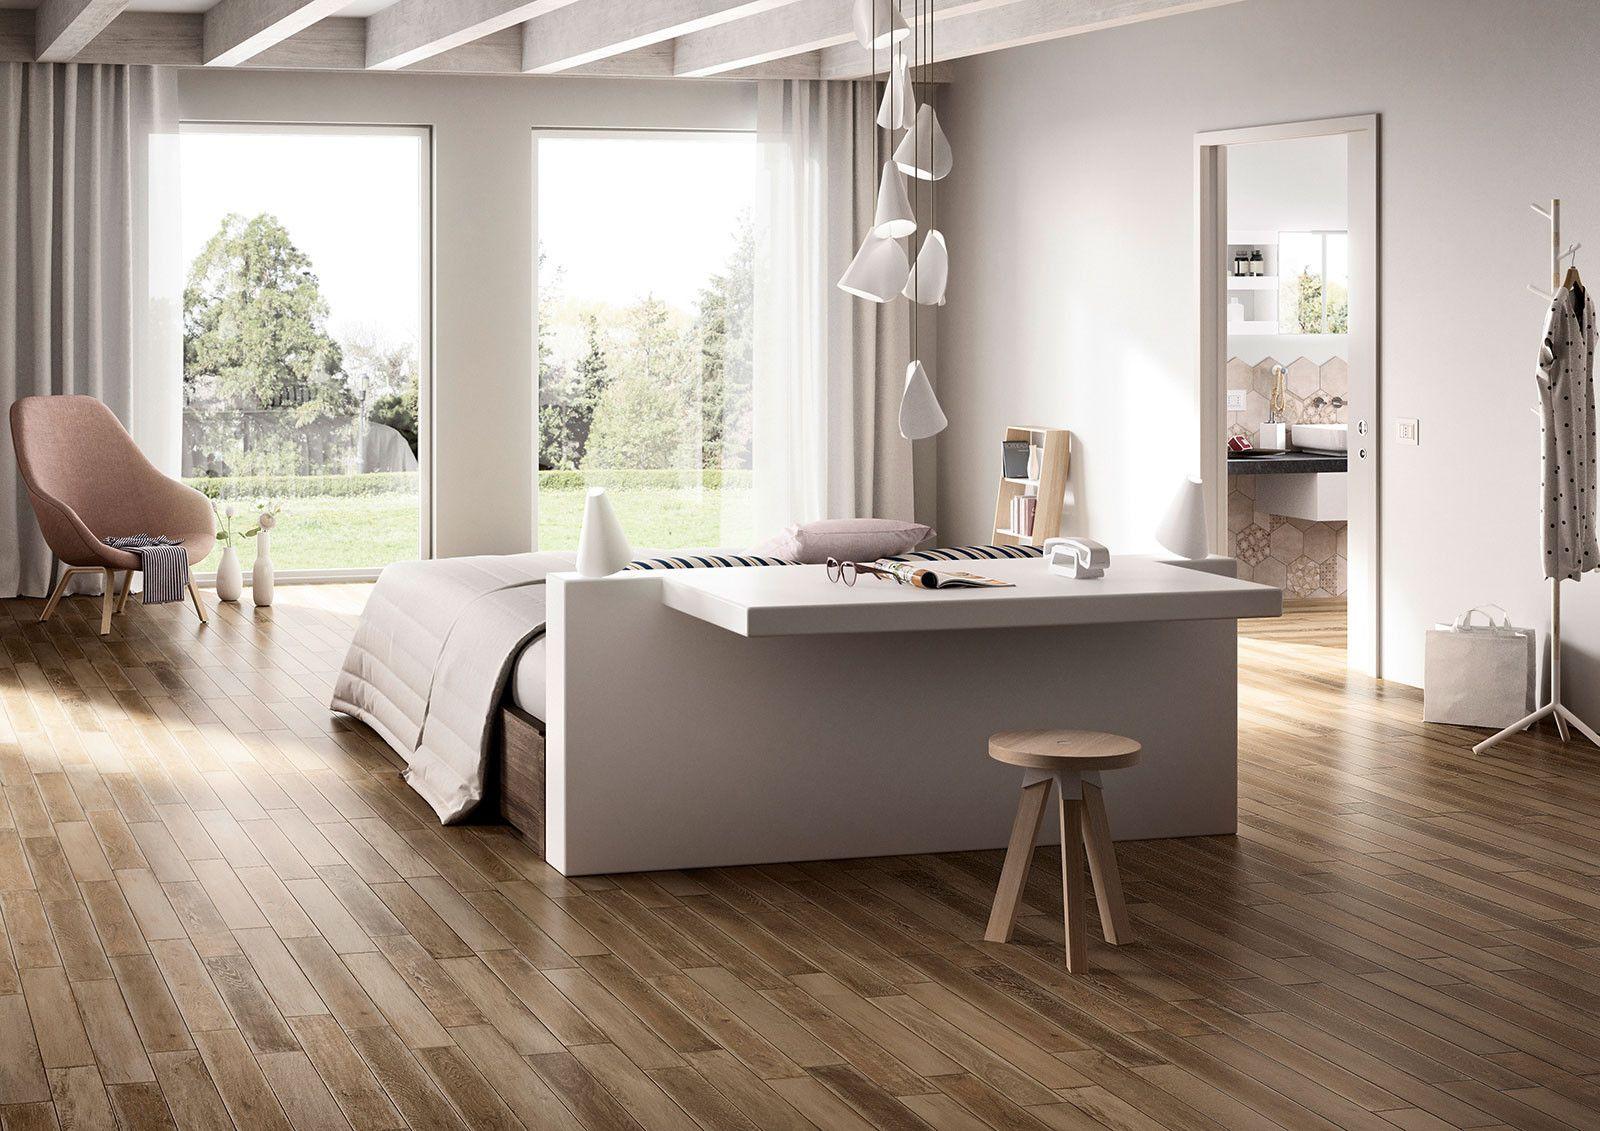 Marazzi #Treverkage Brown 10x70 cm MM8Y   #Feinsteinzeug #Holzoptik ...